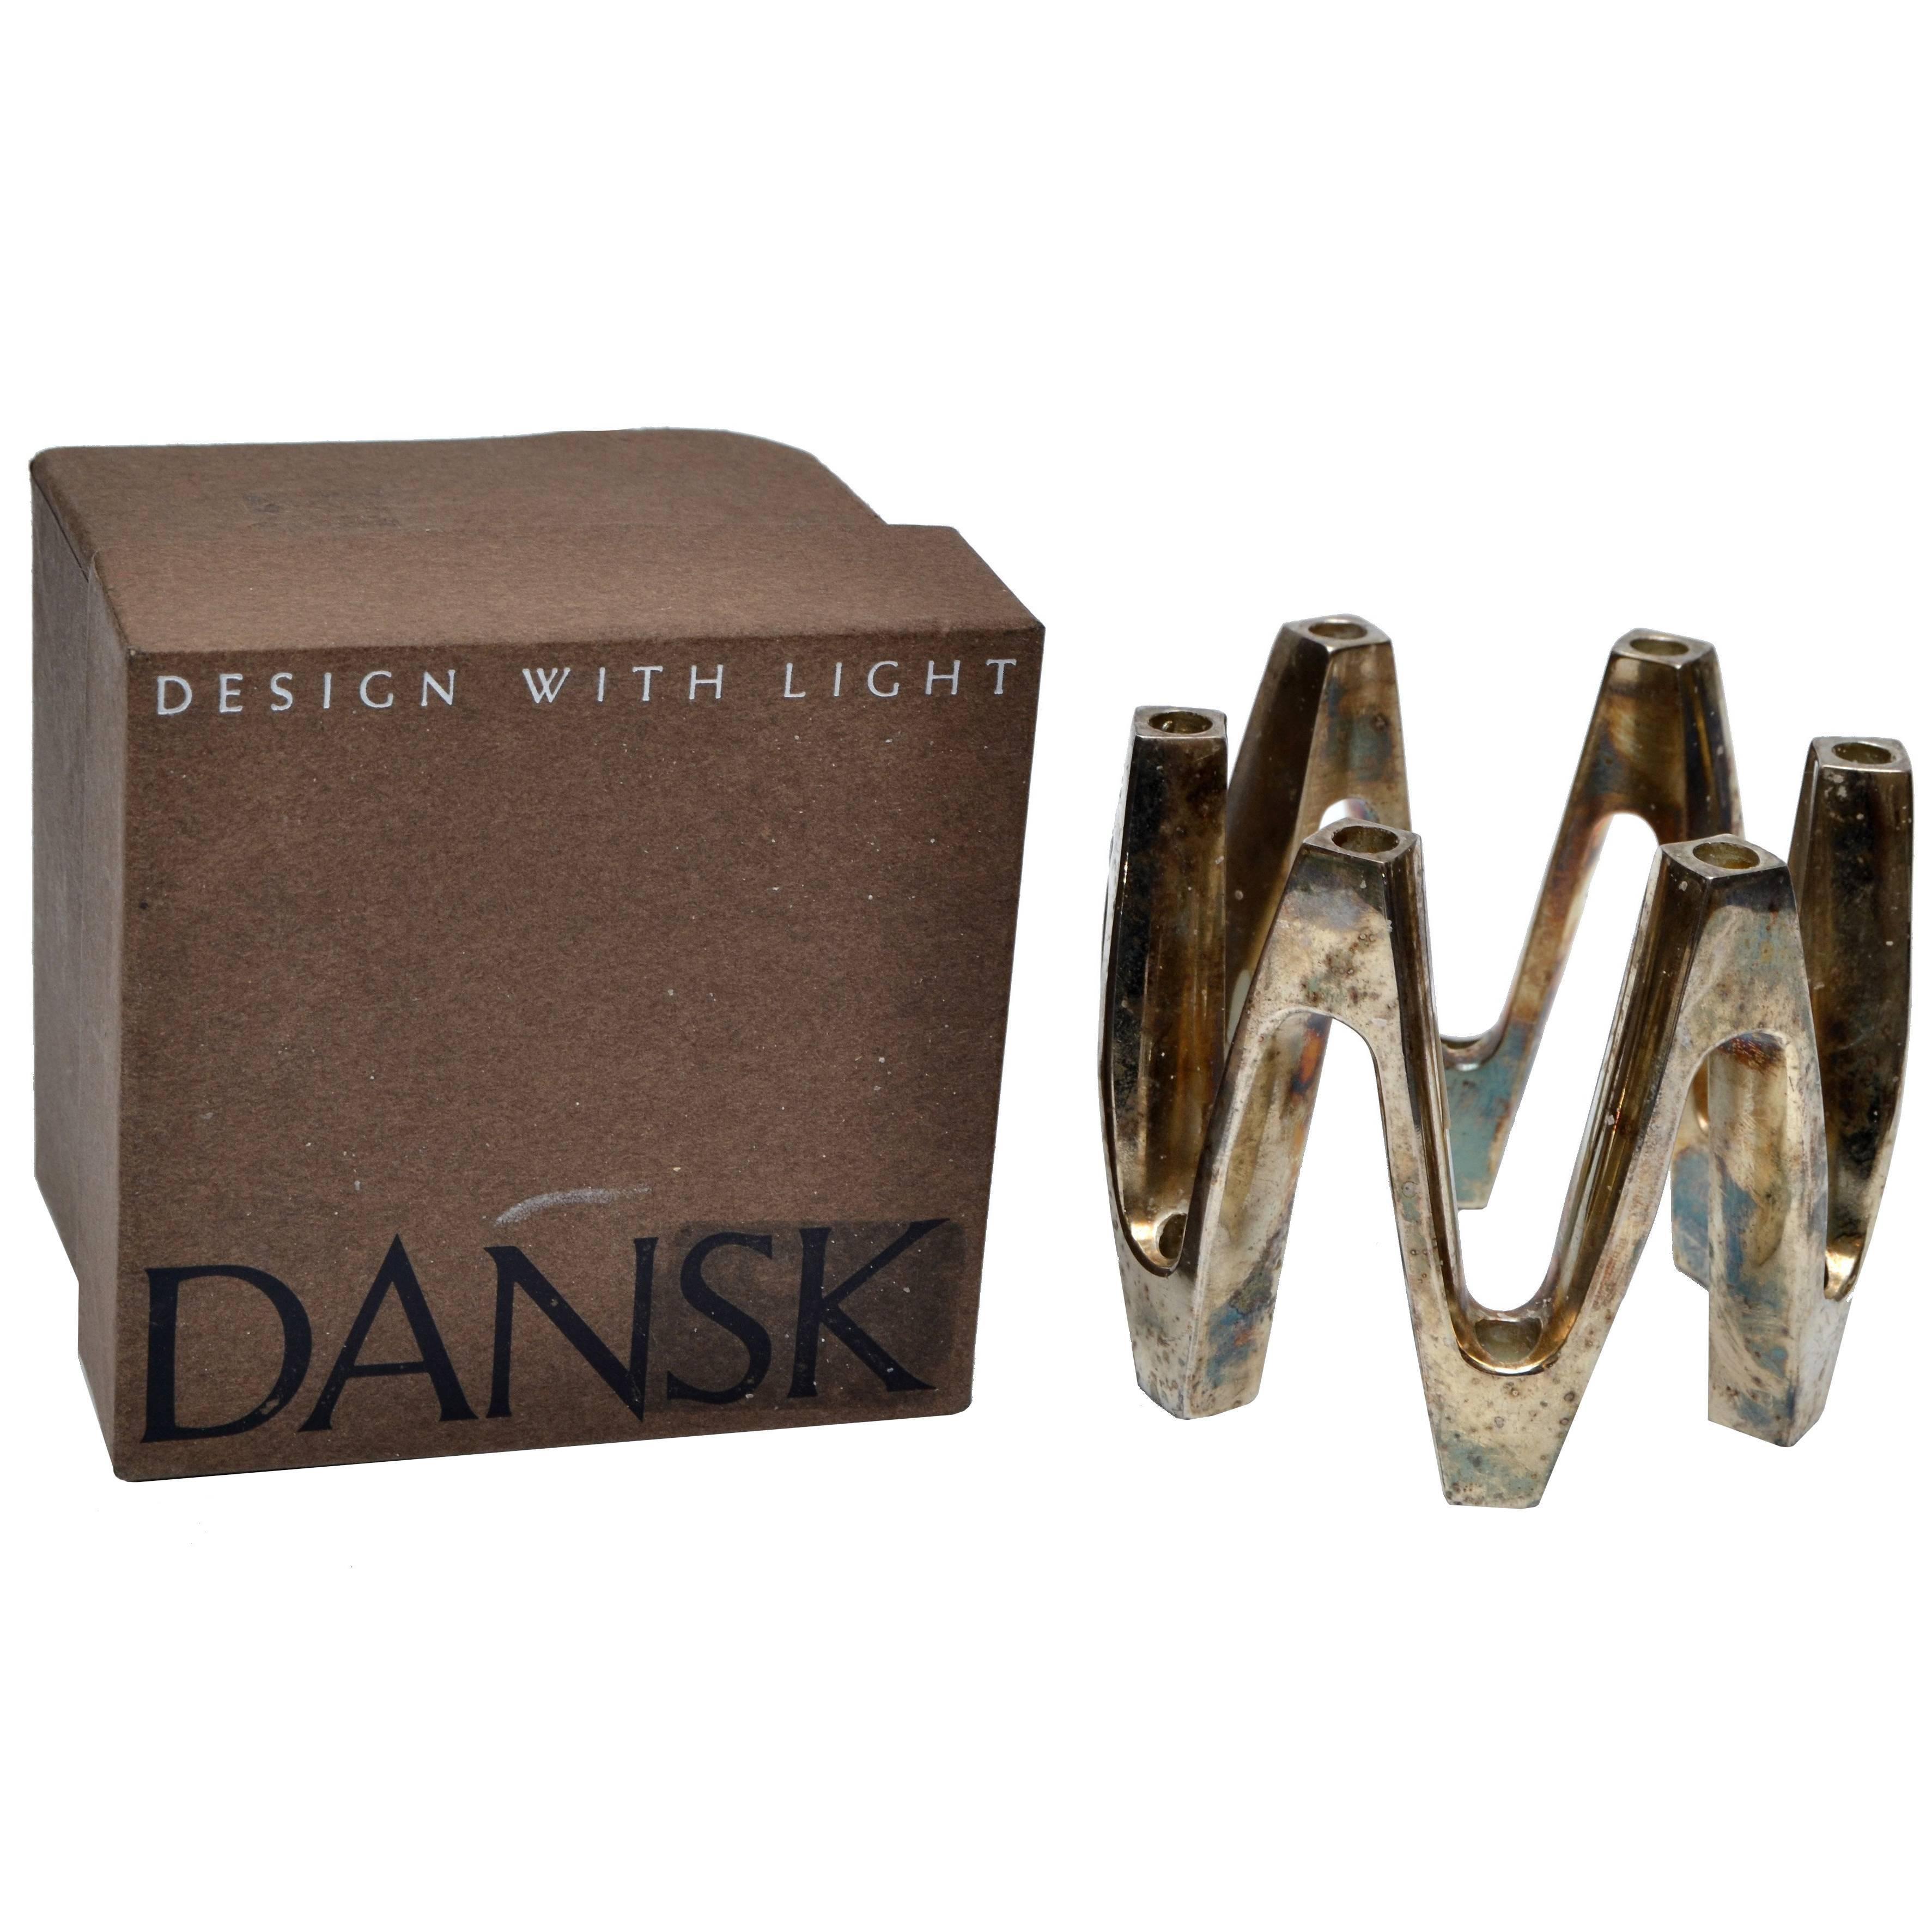 Jens Quistgaard Silver Plate Crown Candle Centerpiece by Dansk